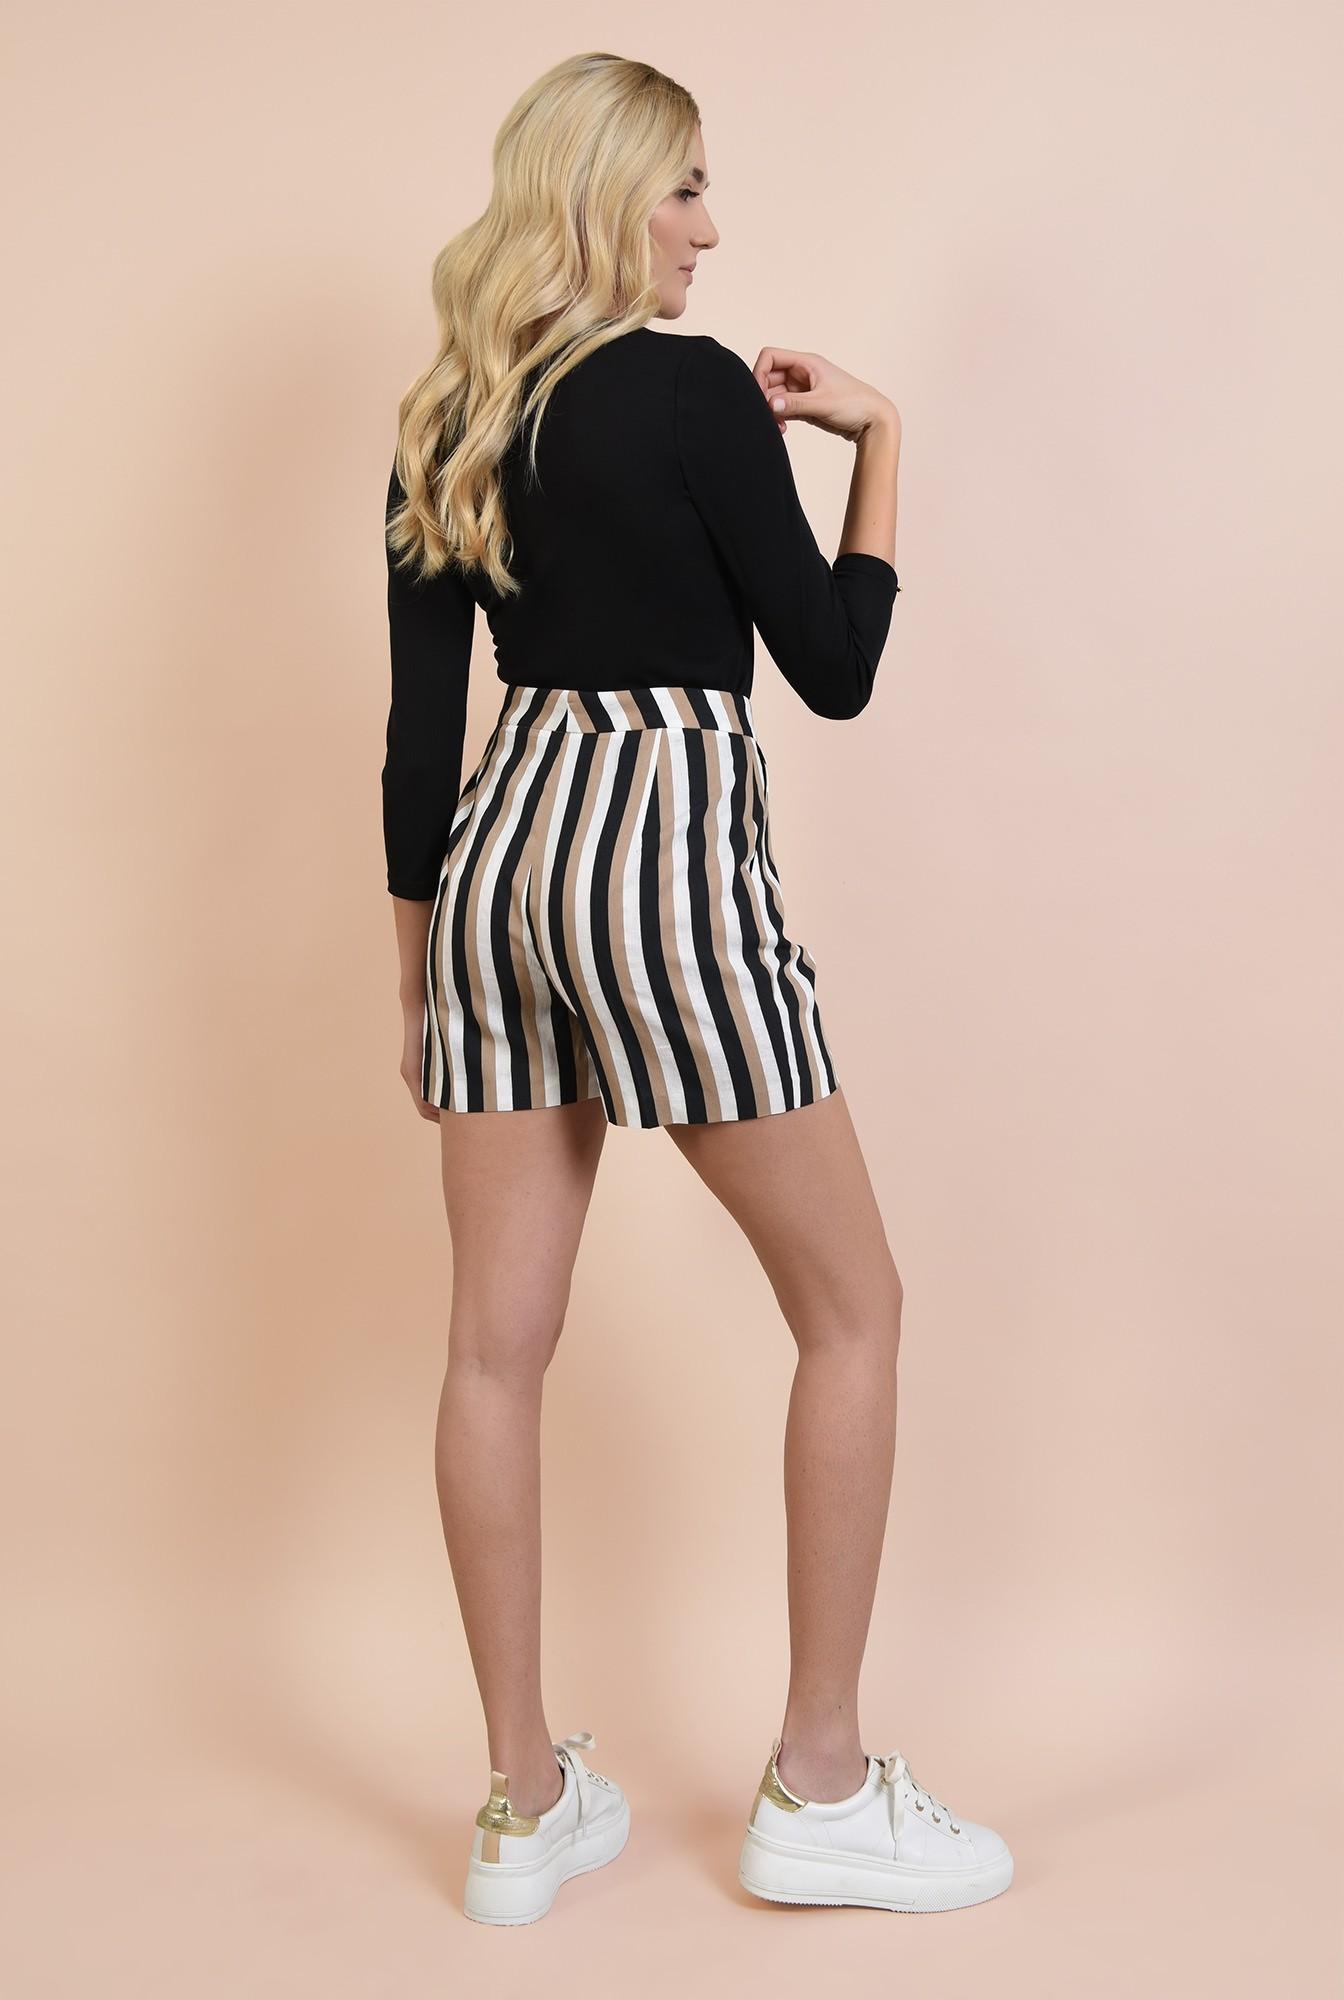 0 - 360 - pantaloni scurti, cu dungi, talie inalta cu betelie, imprimeu